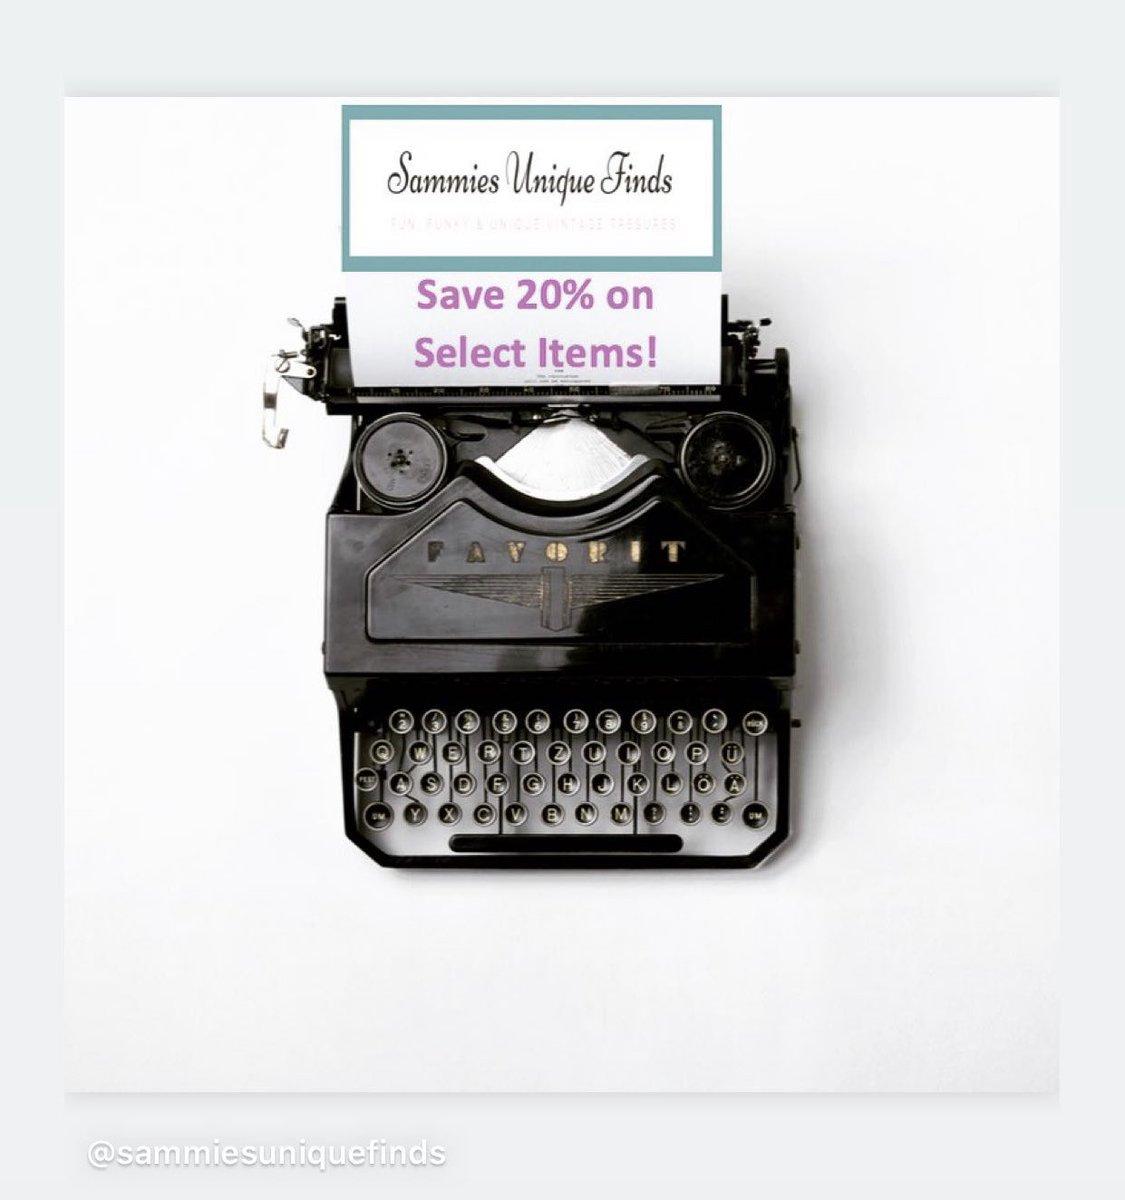 Shop my sale: 20% off select items #sammiesuniquefinds #etsyfinds #etsygifts #etsysale #etsycoupon #shopsmall https://etsy.me/2NIqJkfpic.twitter.com/tFlBOHAerE